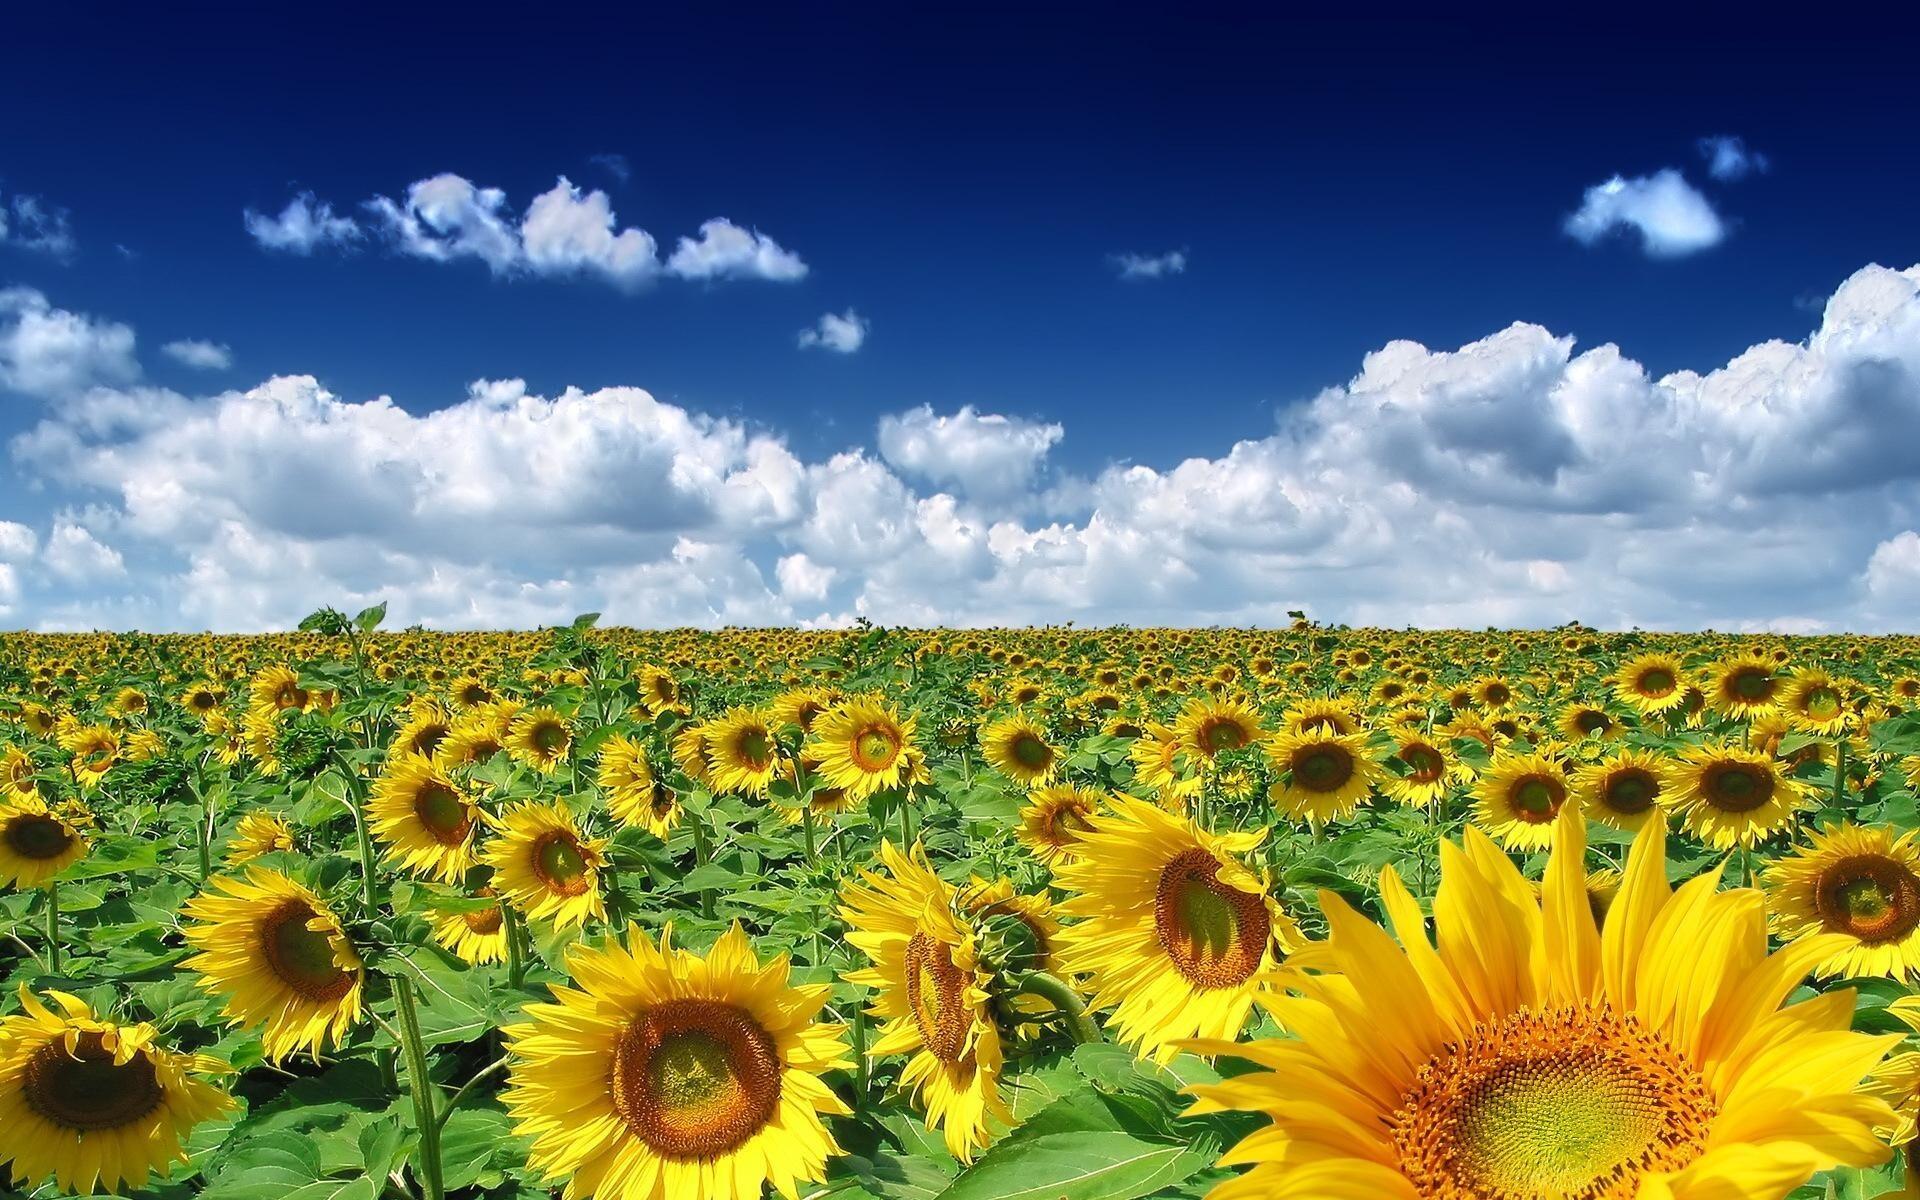 Beautiful sunflowers farm hd wallpapers izmirmasajfo